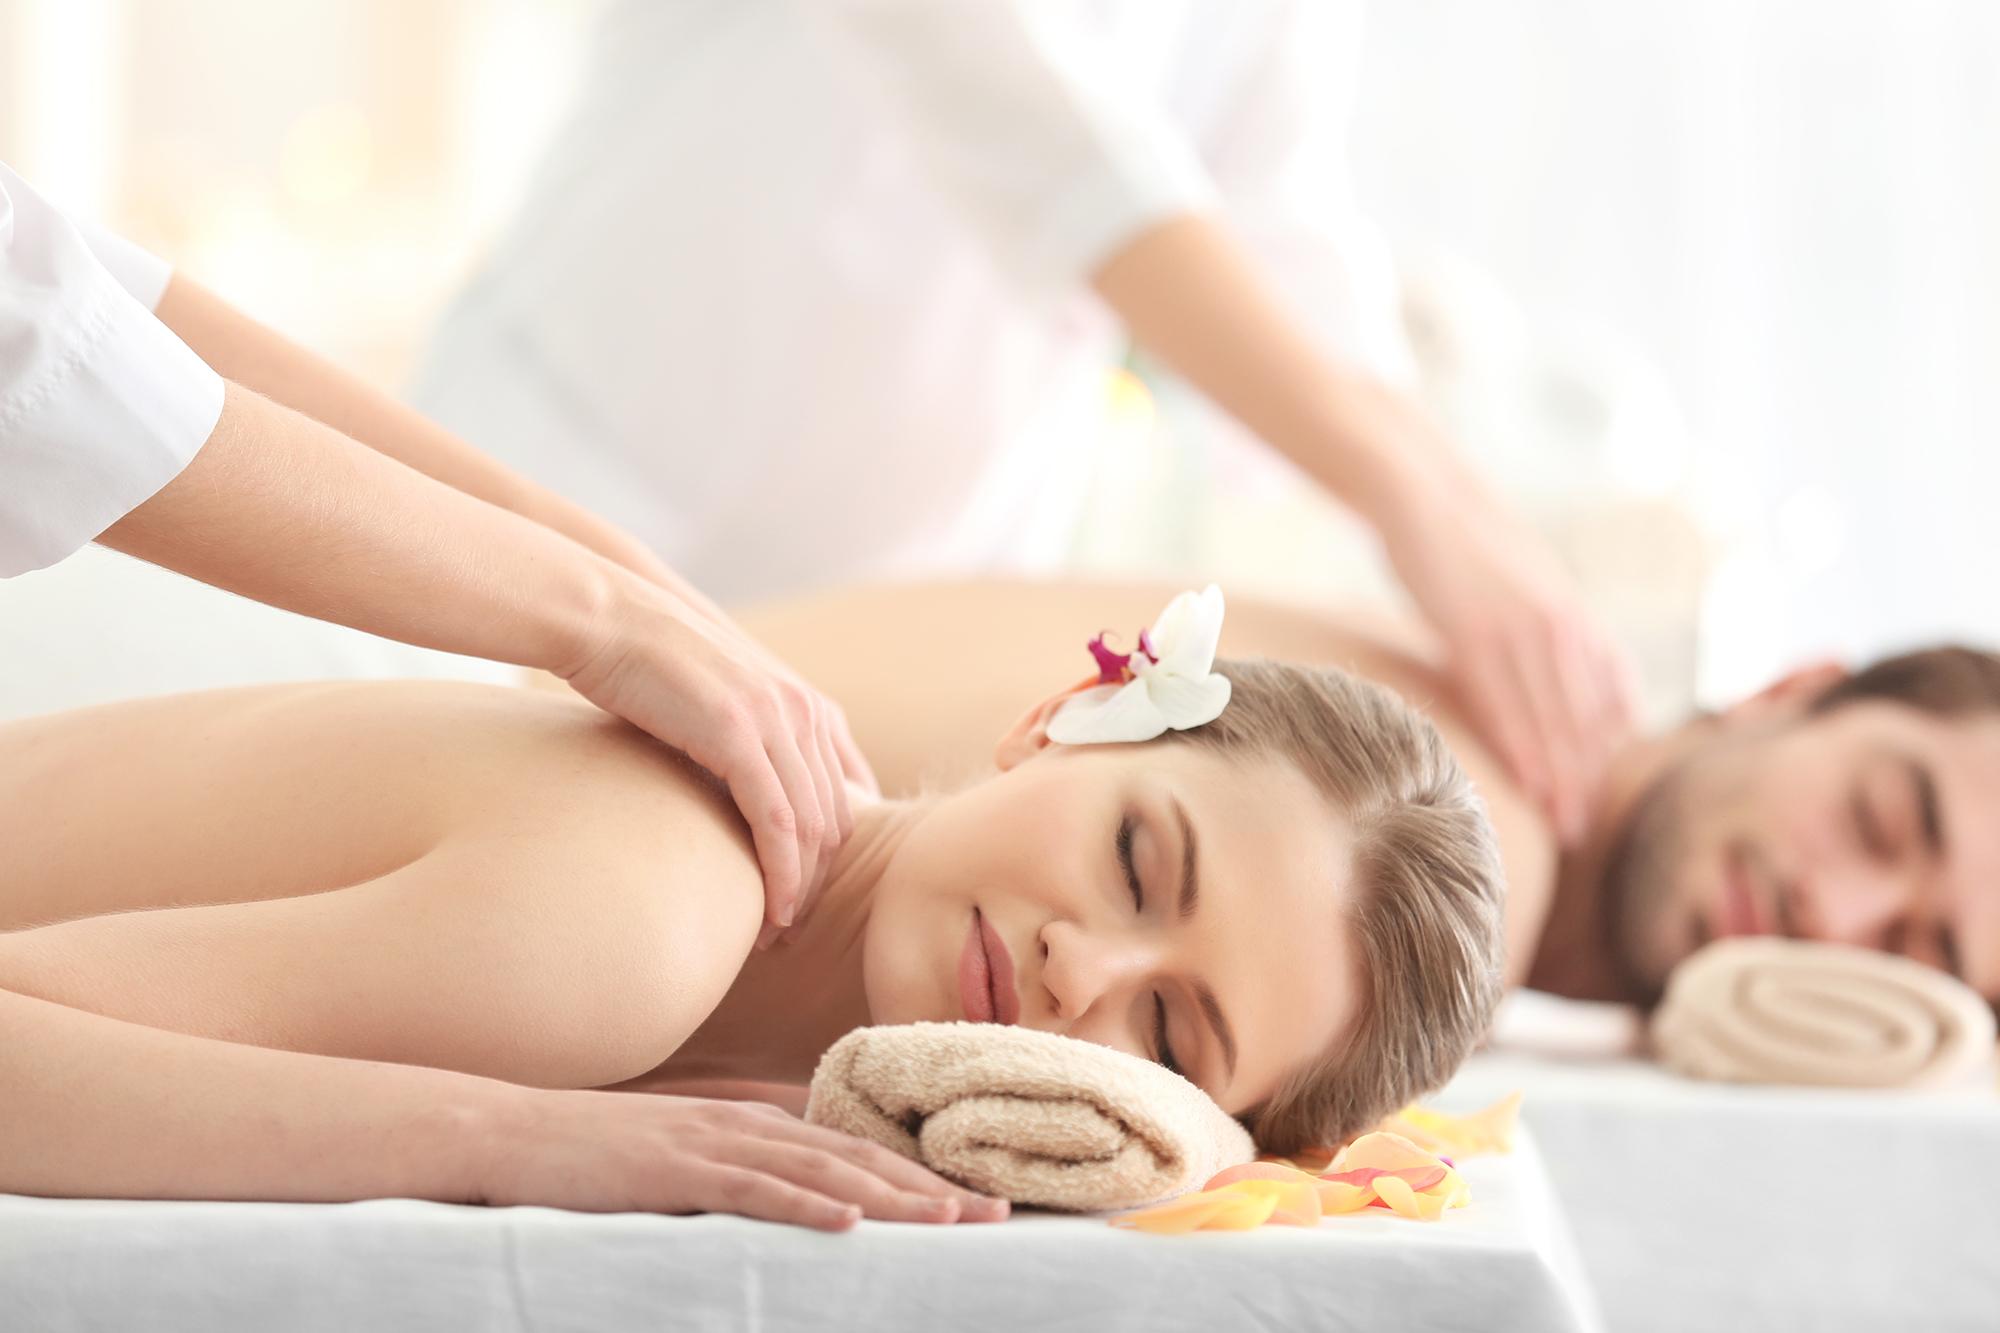 Erotic Massage Uk